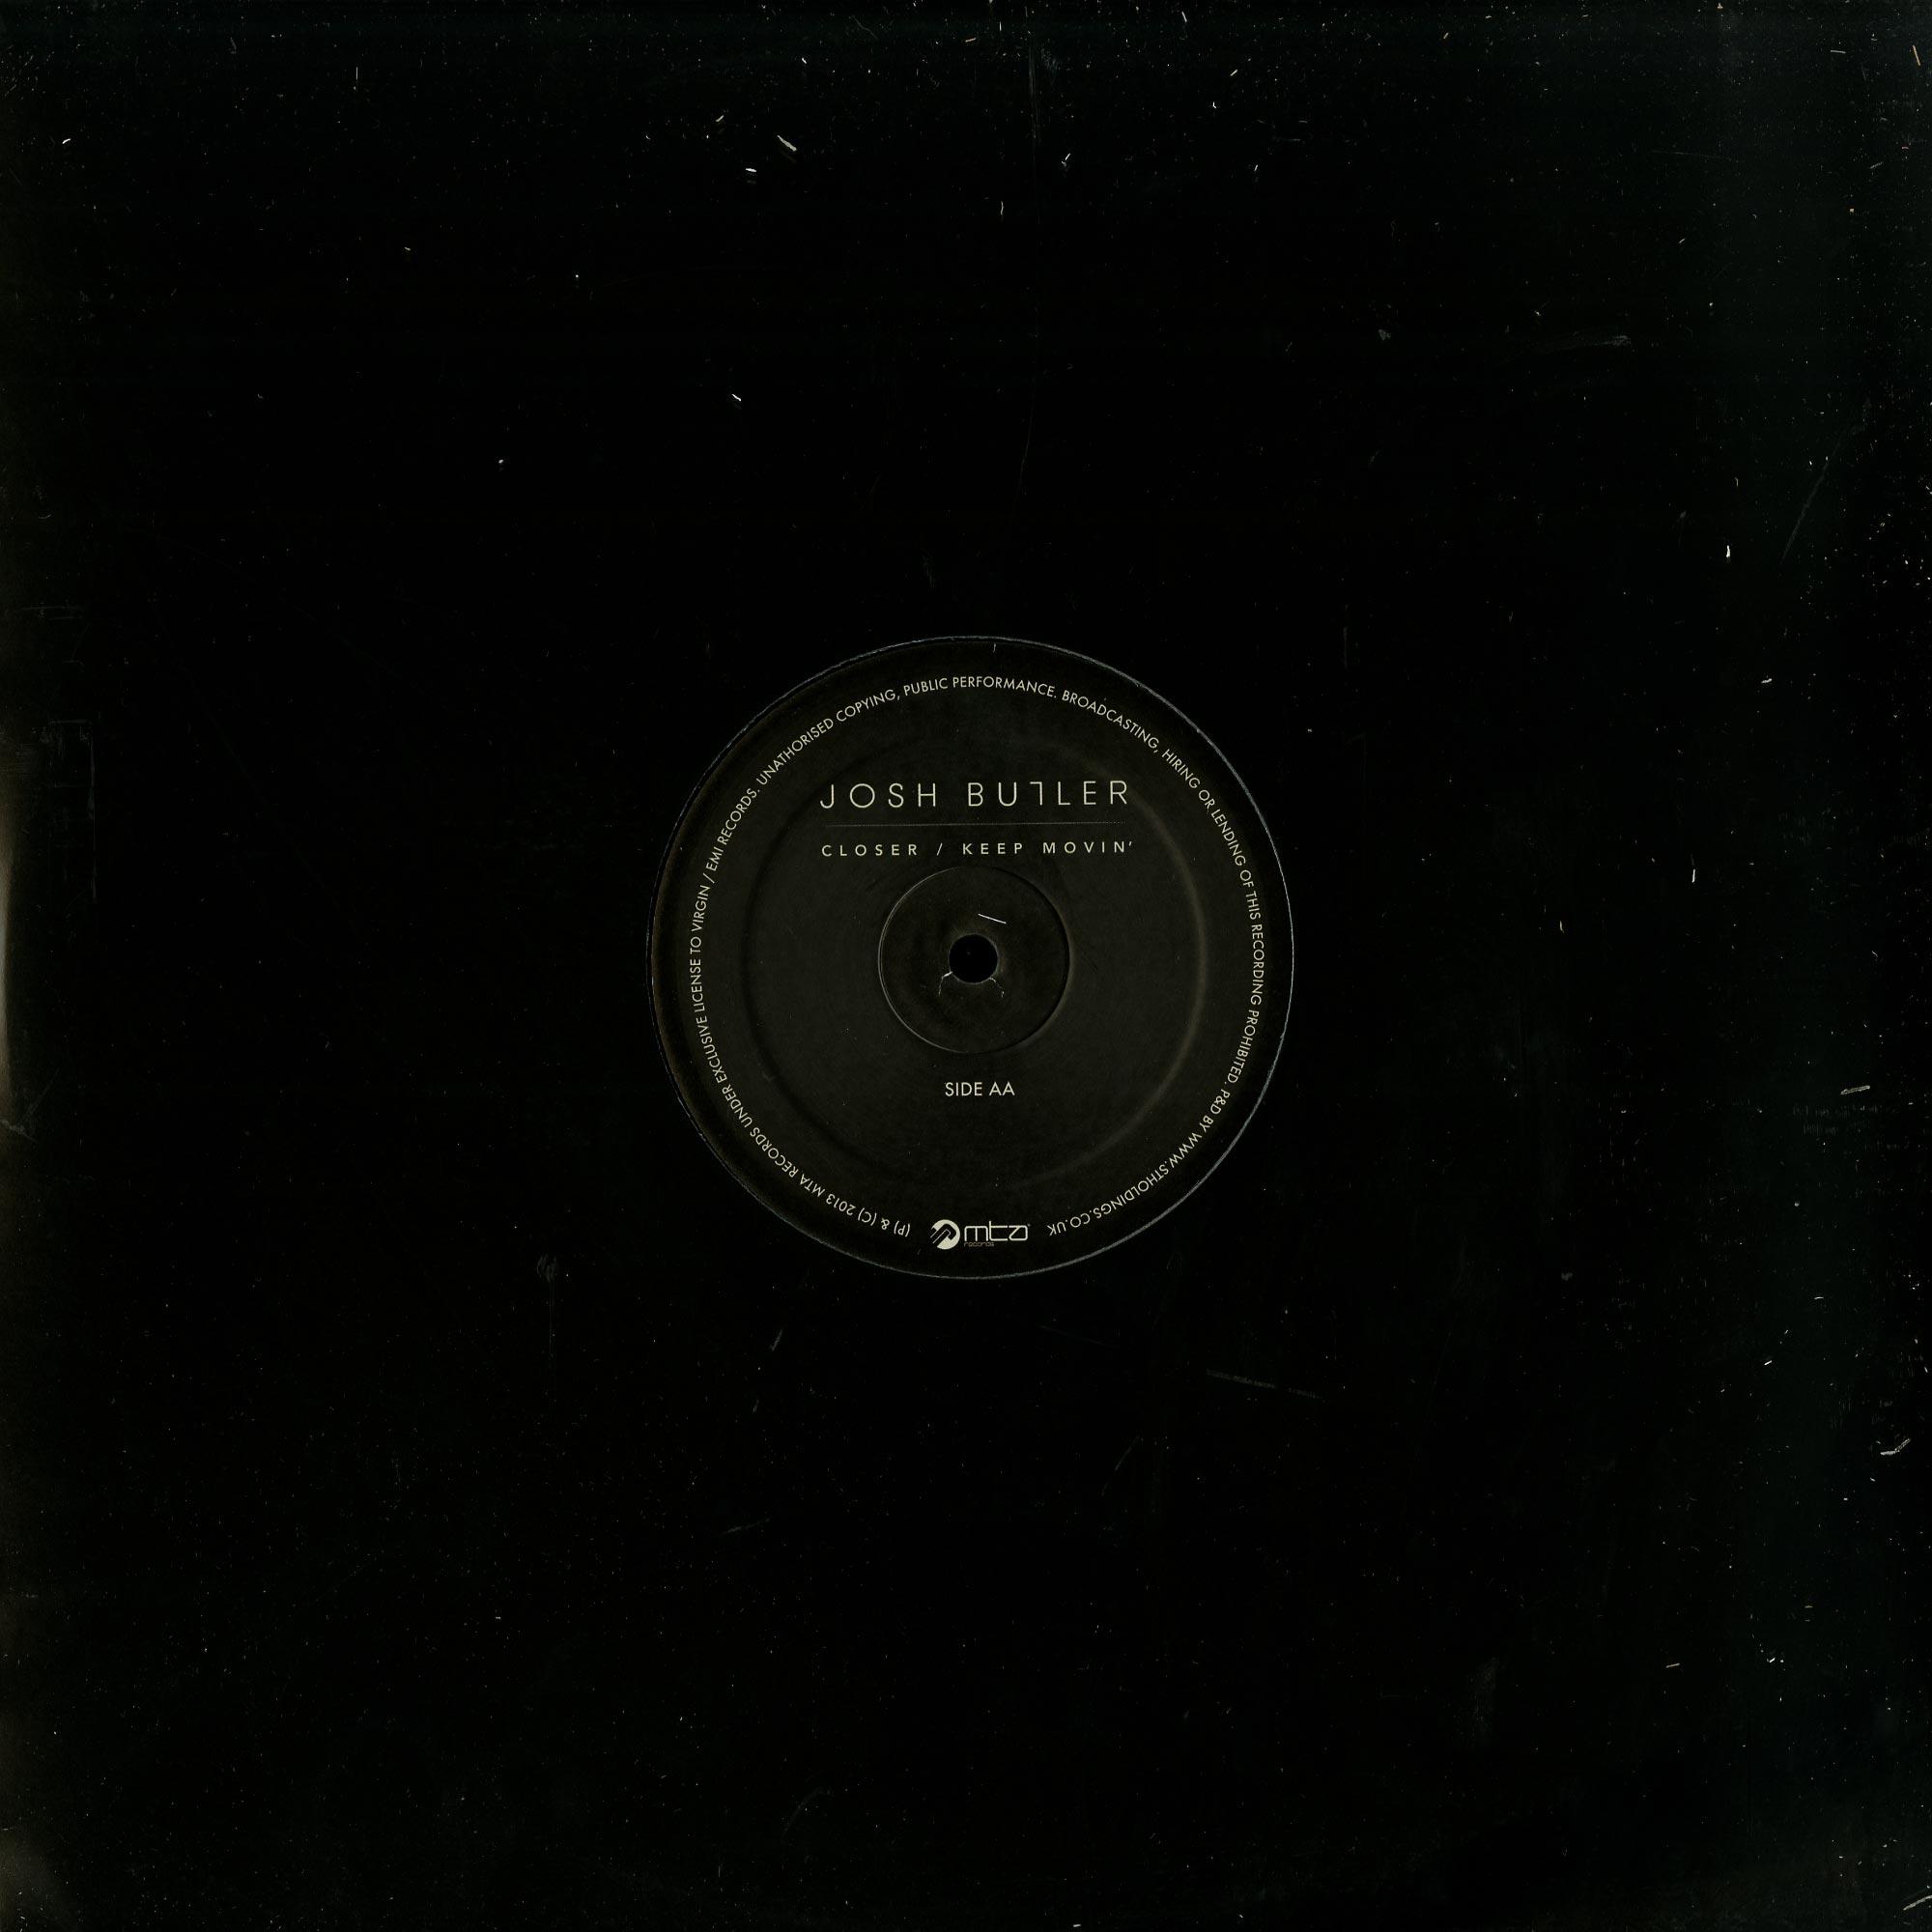 Josh Butler - CLOSER / KEEP MOVIN